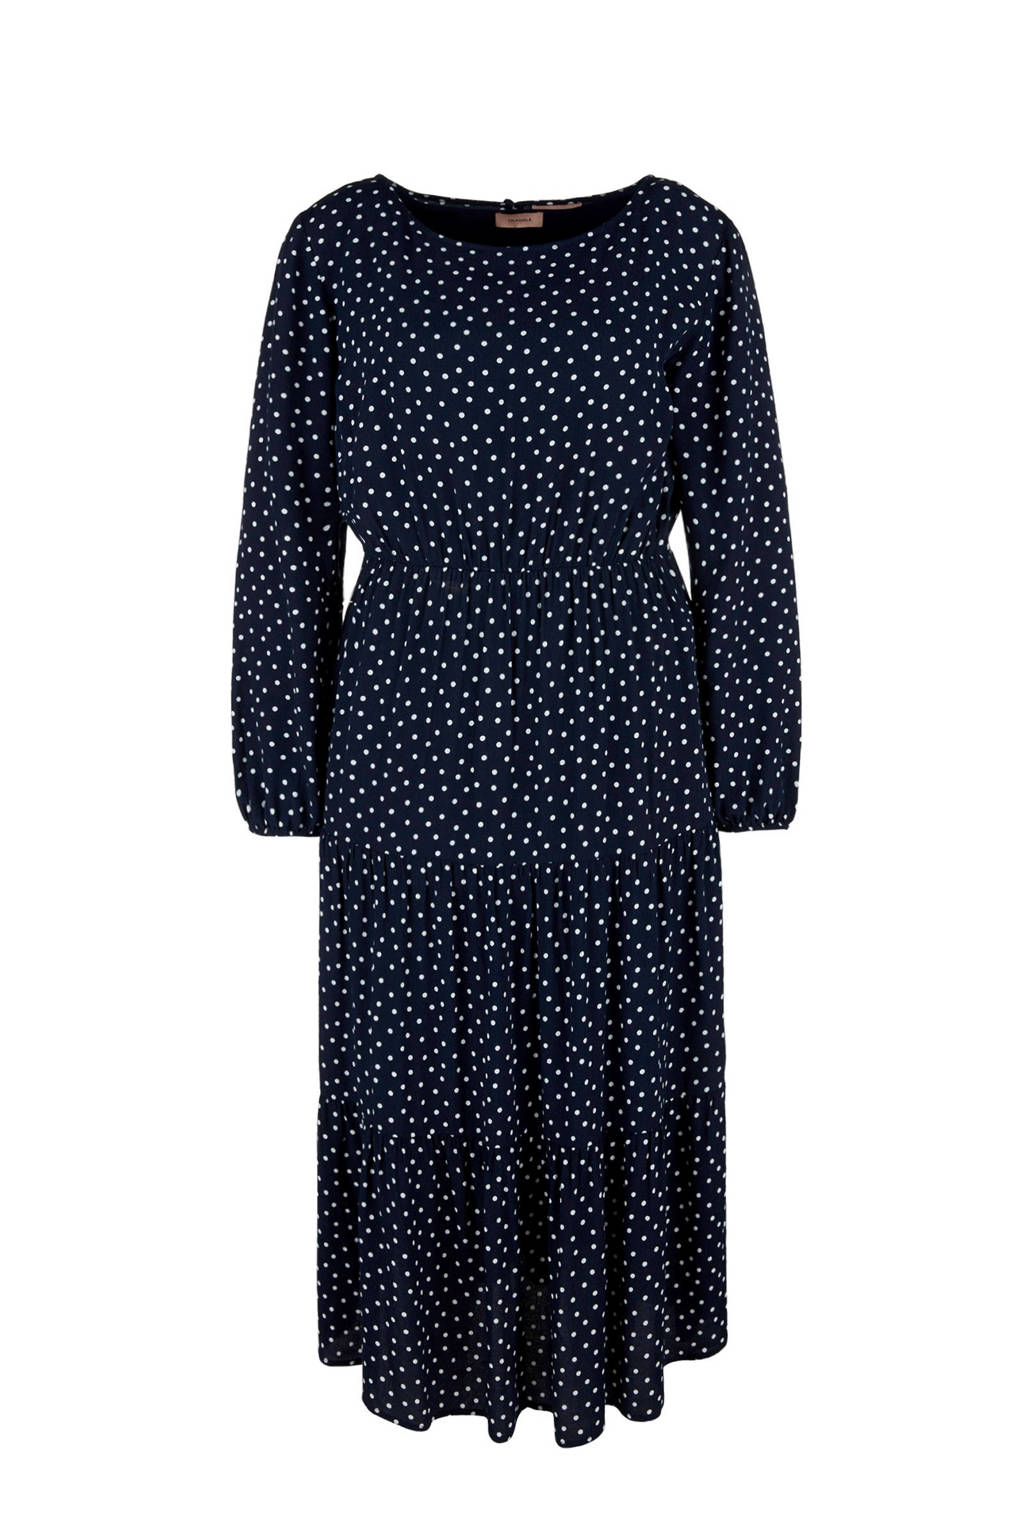 TRIANGLE jurk met stippen donkerblauw, Donkerblauw/witte